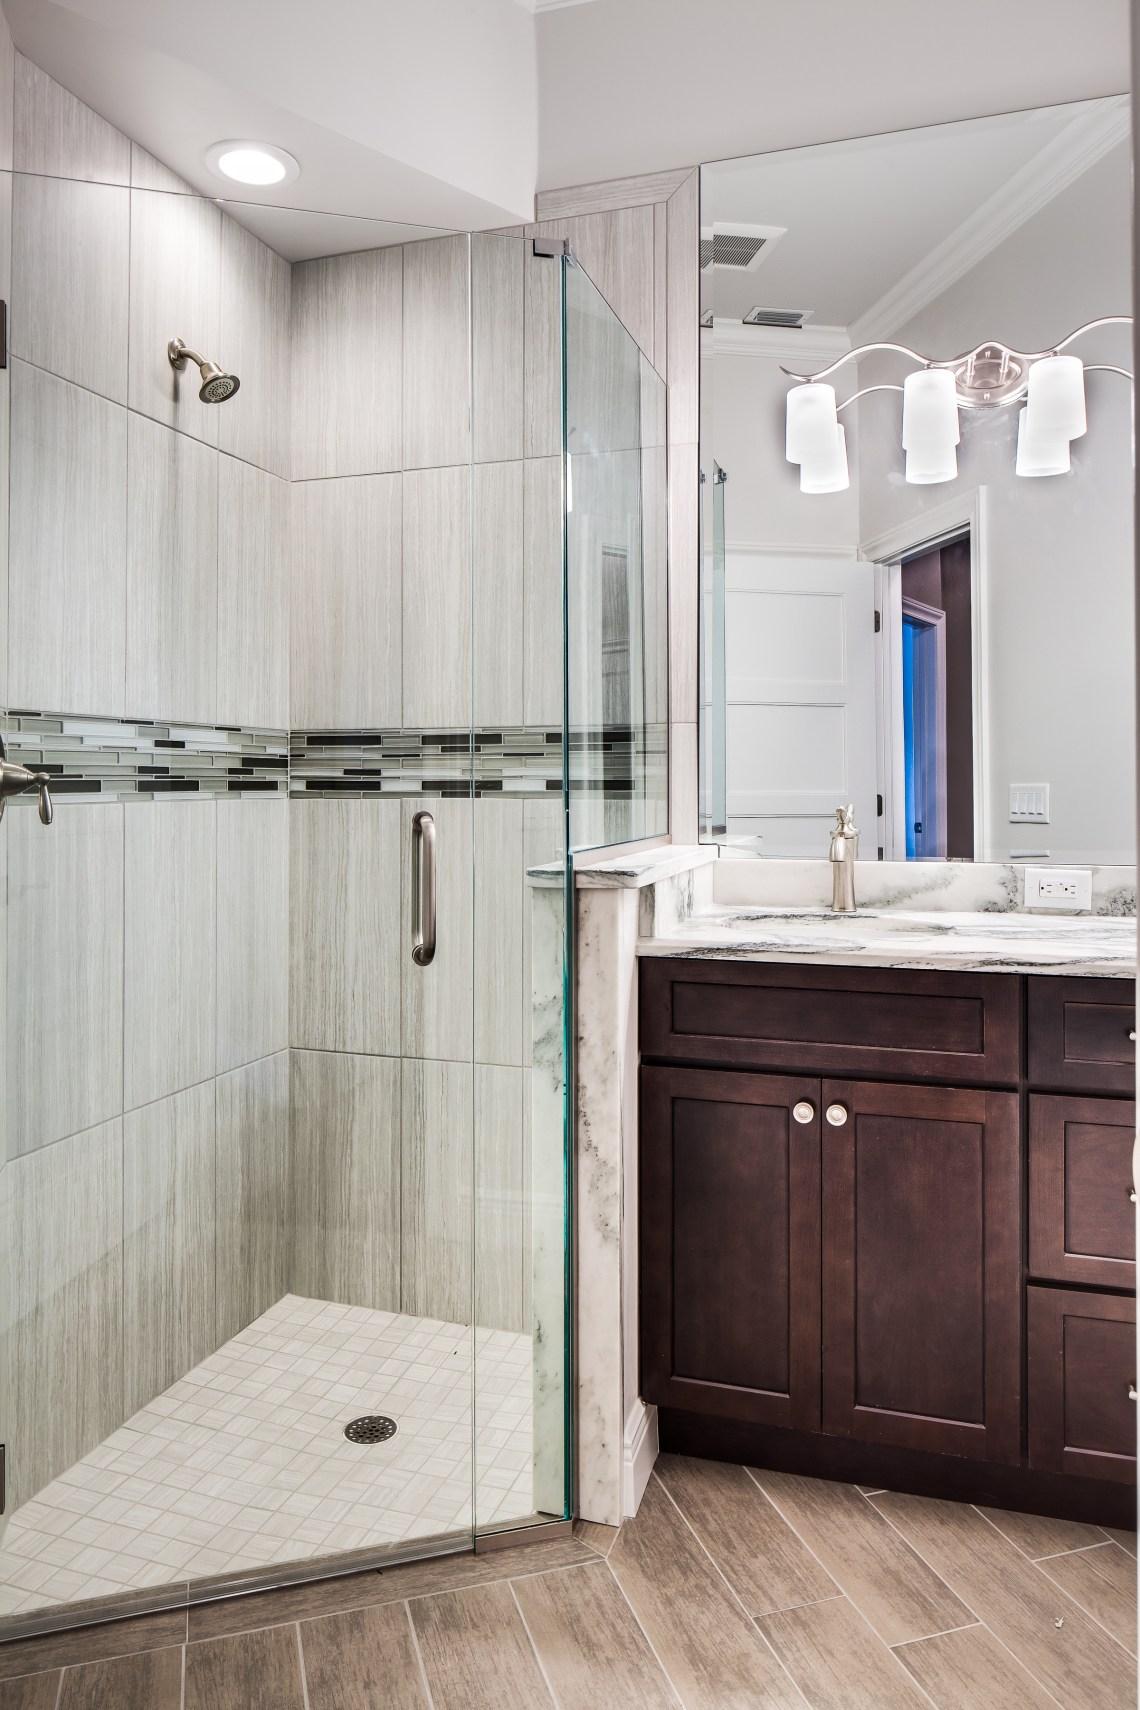 Image Result For The Best Way To Clean Glshower Doors